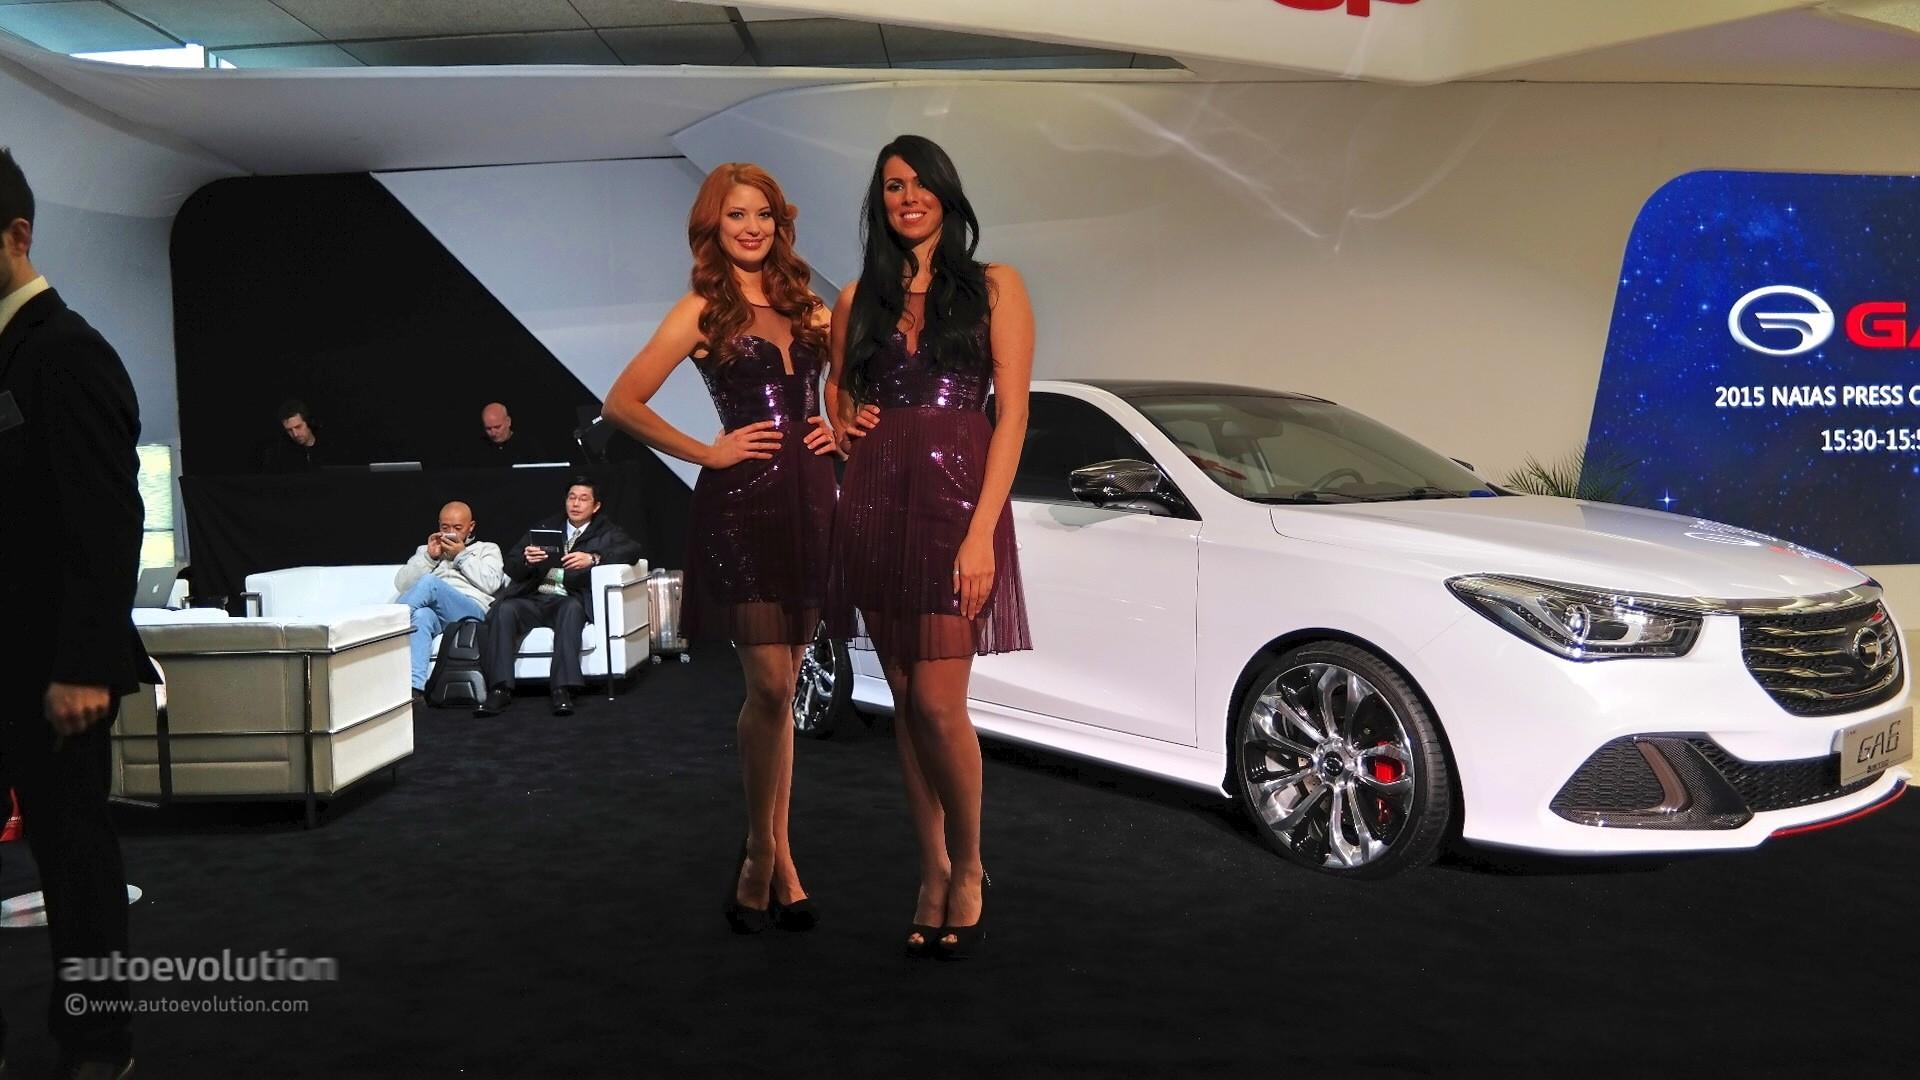 DETROIT AUTO SHOW Car News Auto Photos Prices Release Dates - Auto show prices